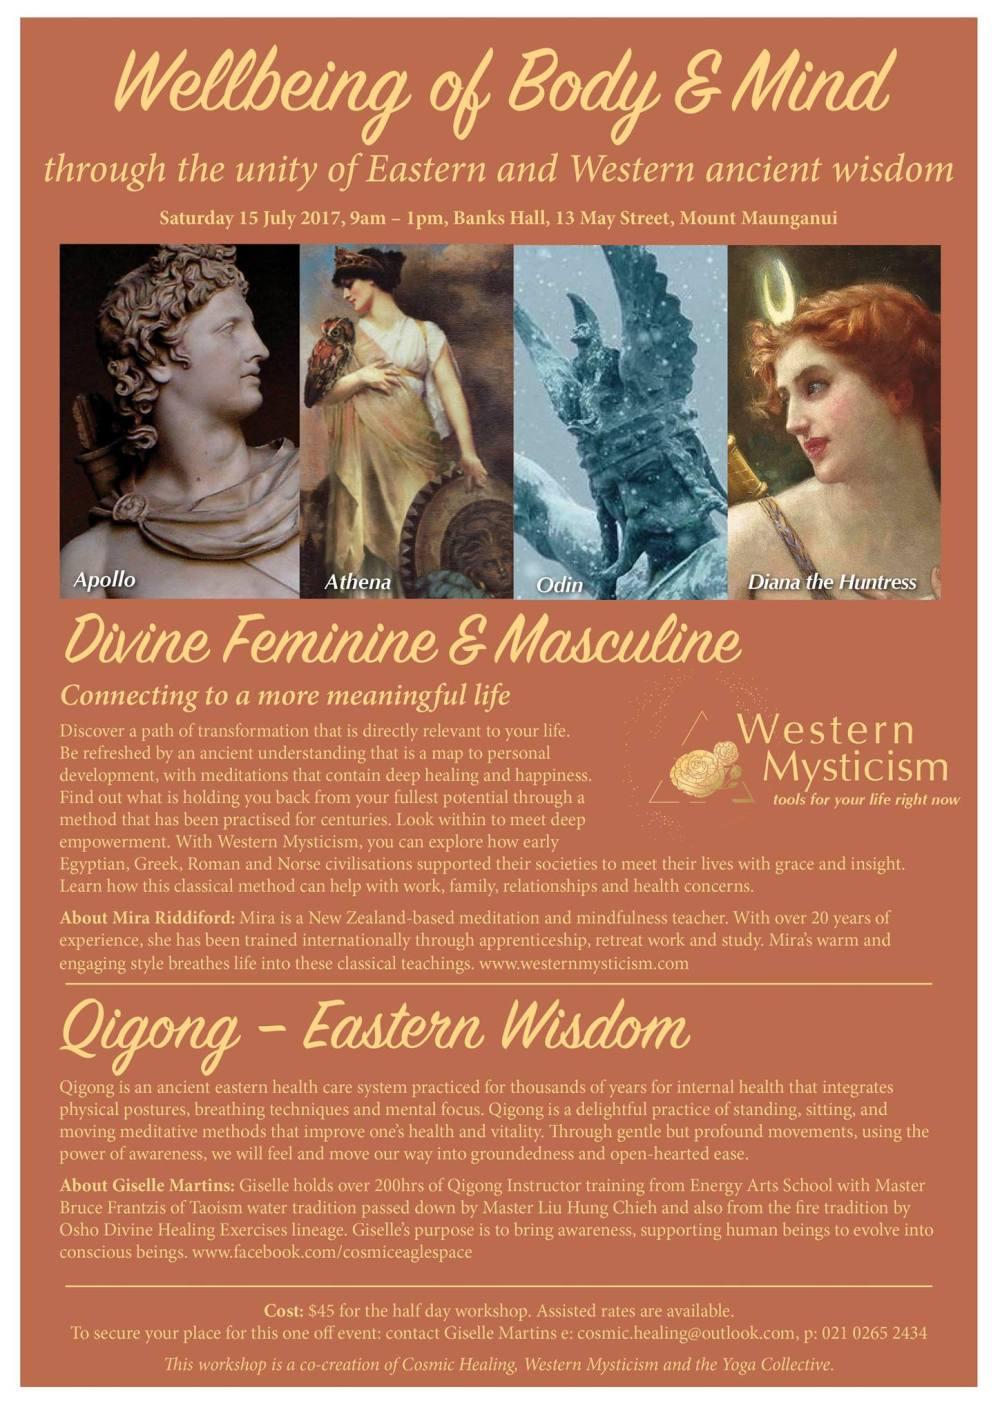 inner wisdom wellbeing of body & mind